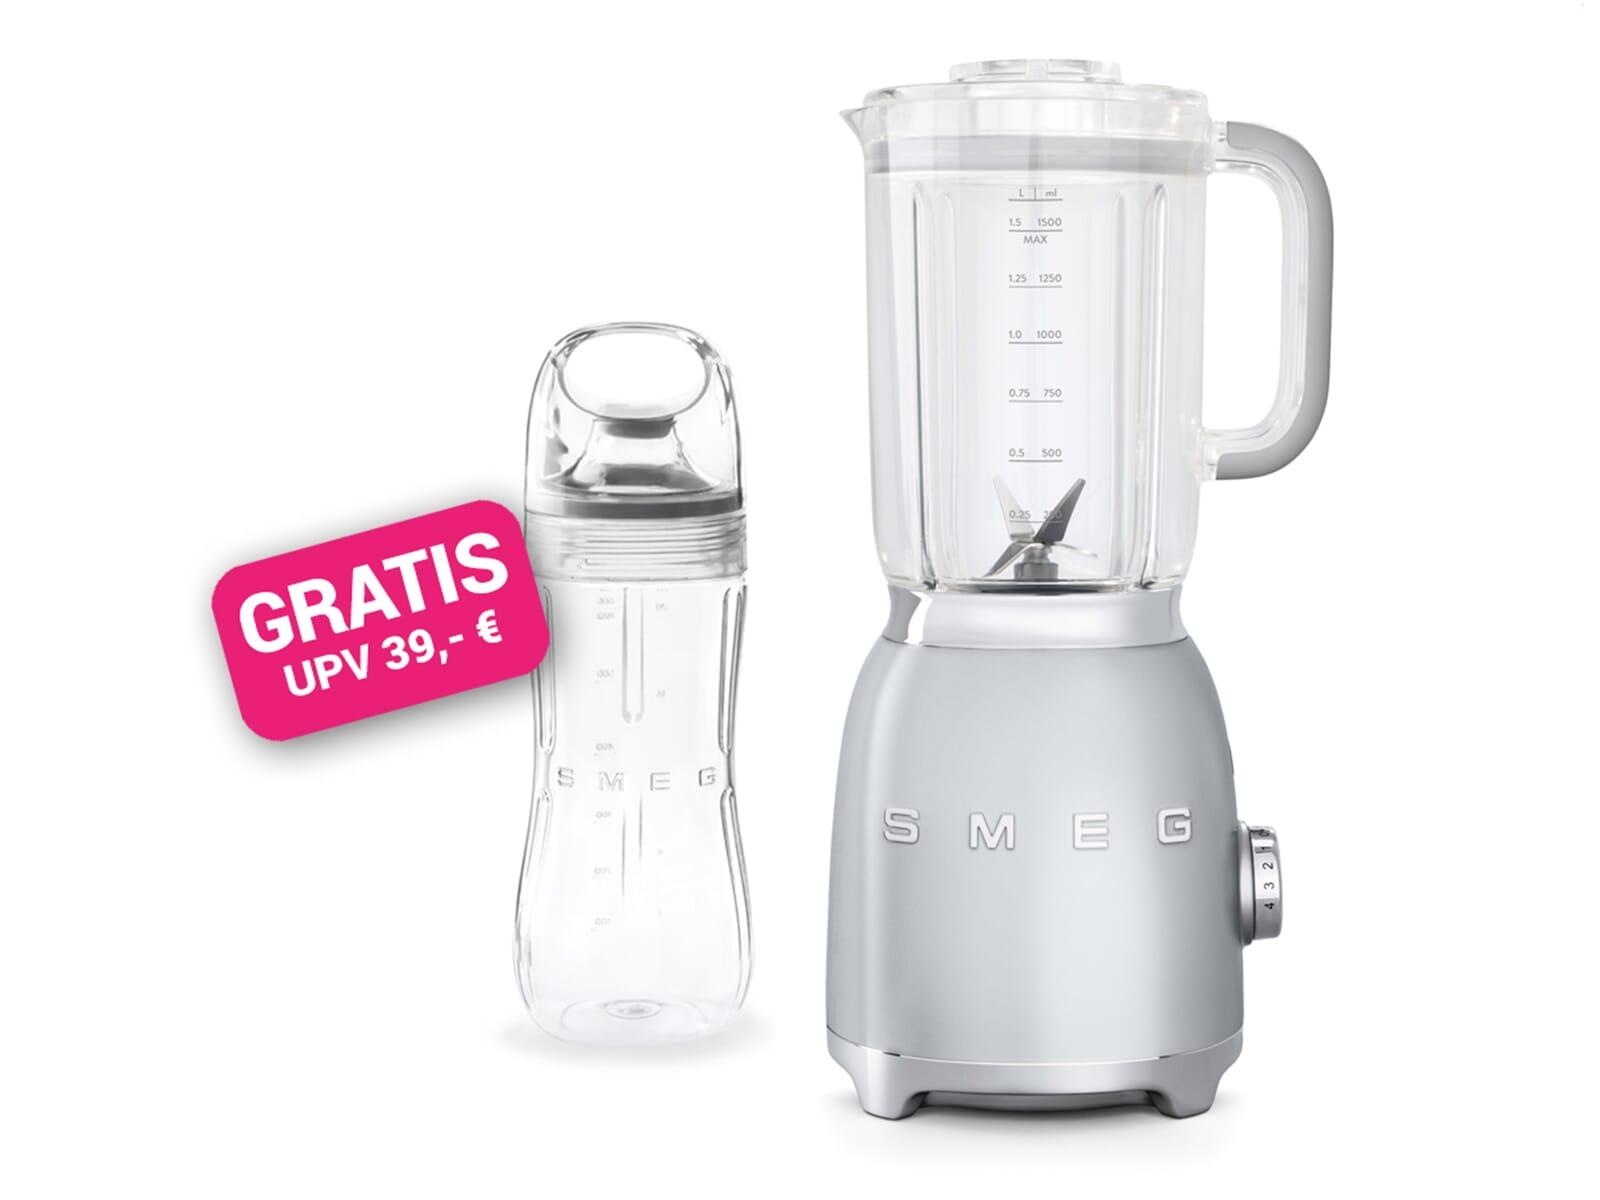 Smeg BLF01SVEU Standmixer Polarsilber Metallic inkl. GRATIS Trinkflasche BGF01